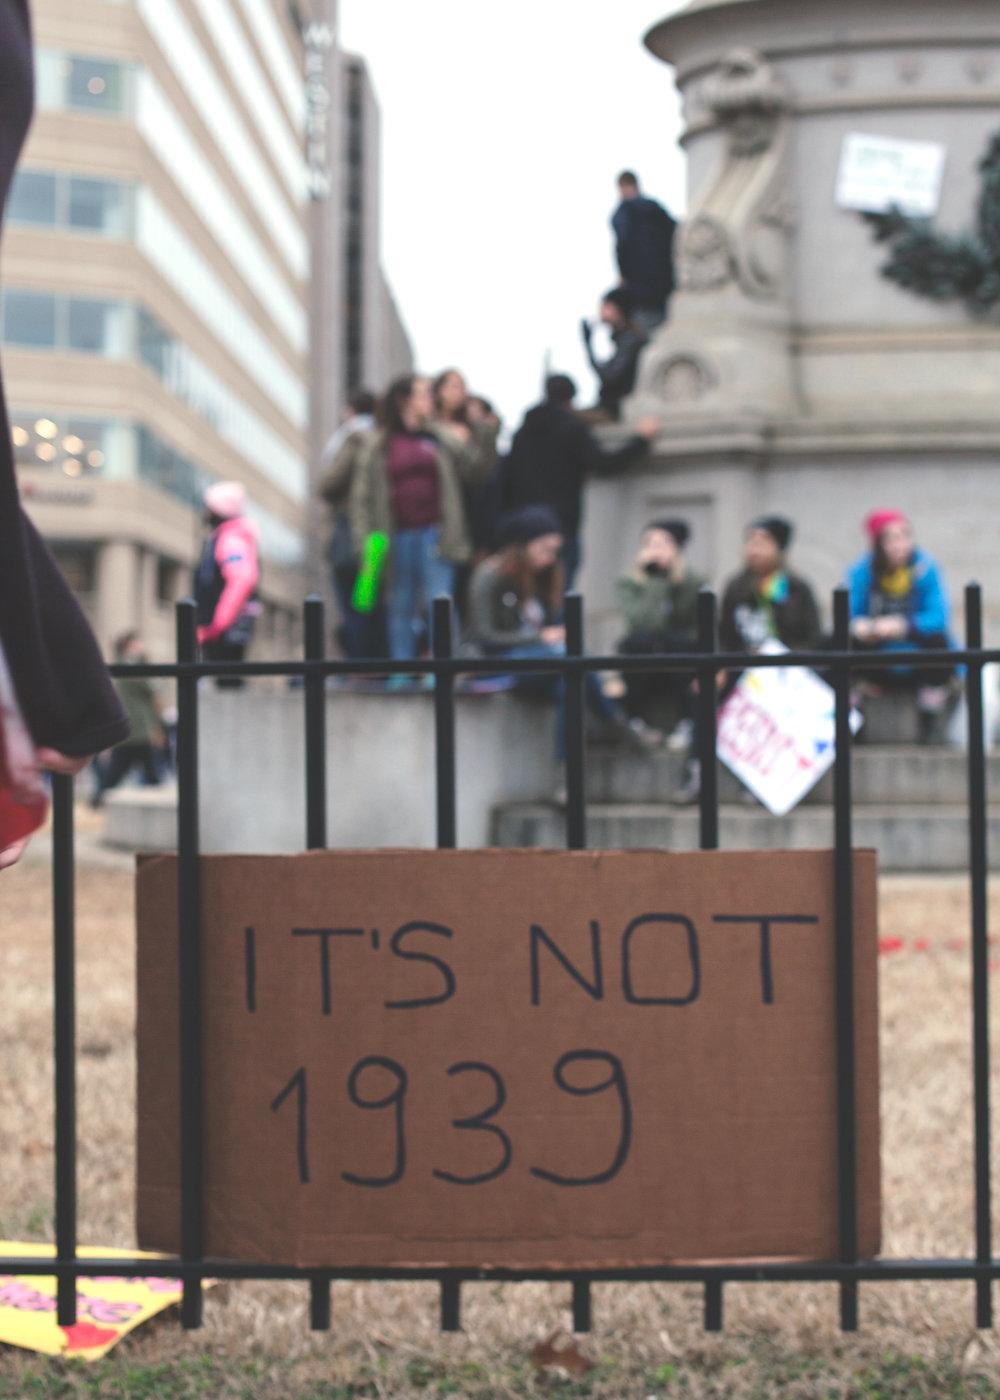 It's Not 1939 Women's March on Washington Zig Metzler